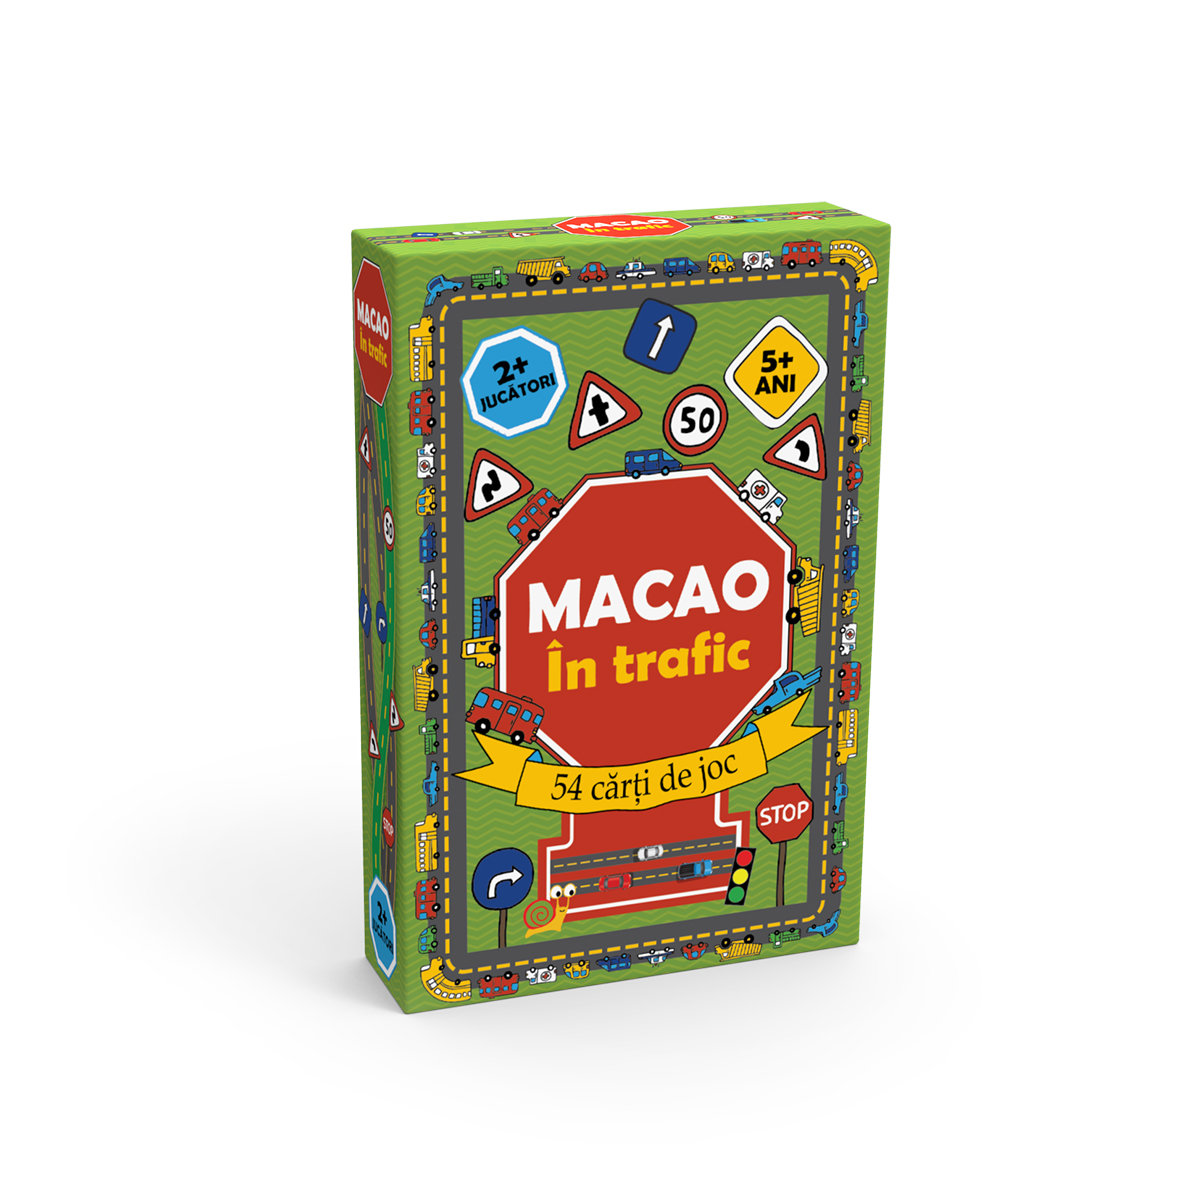 Carti de joc Macao in trafic Noriel